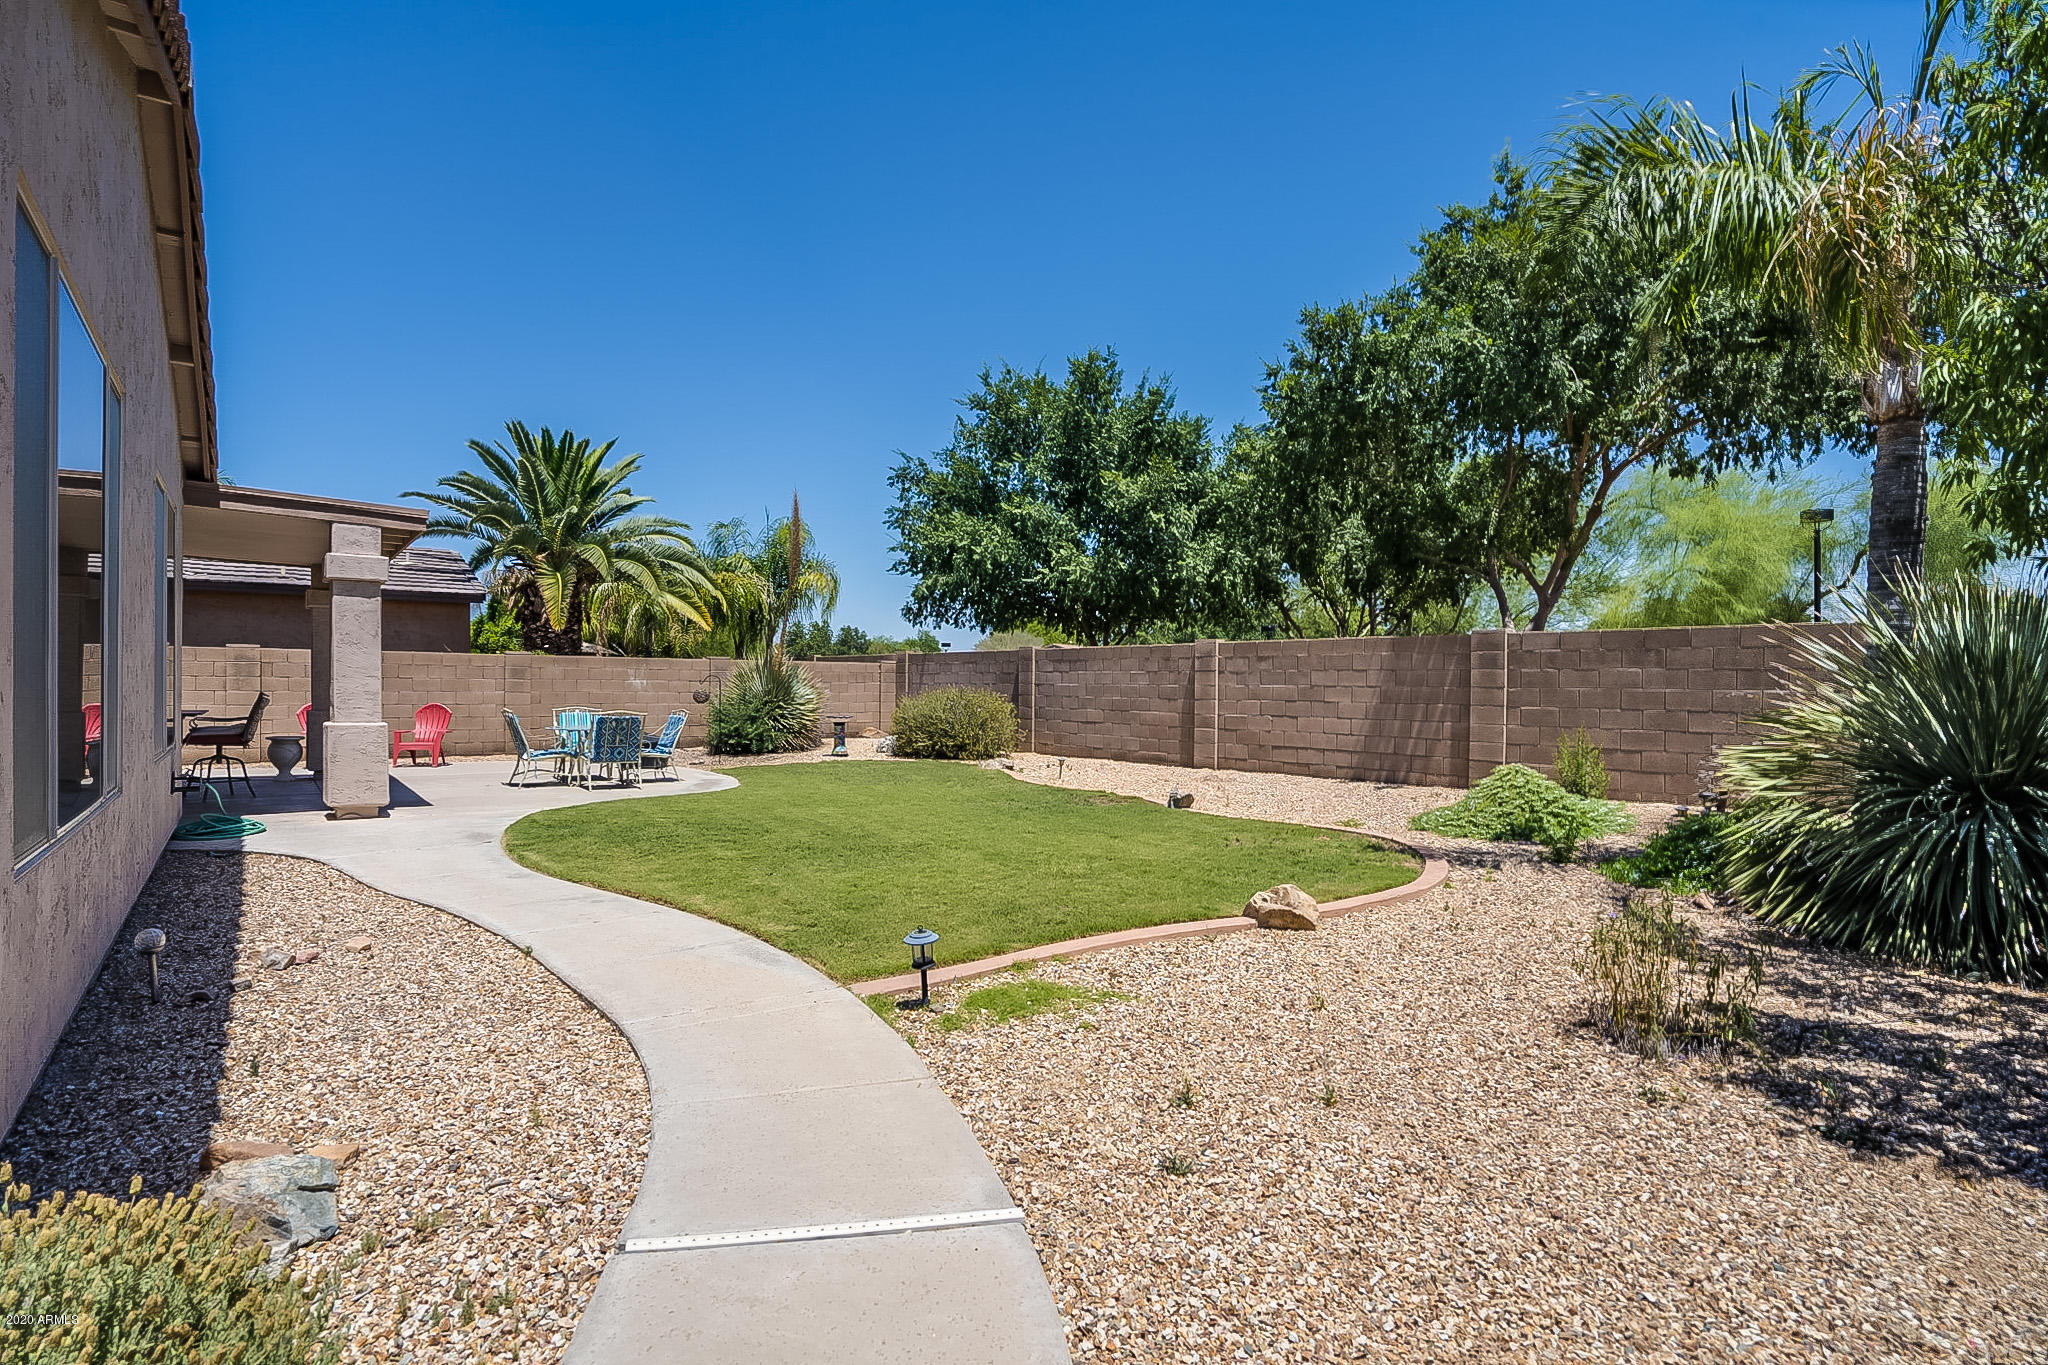 MLS 6085096 431 N ROGER Way, Chandler, AZ 85225 Chandler AZ Dobson Place